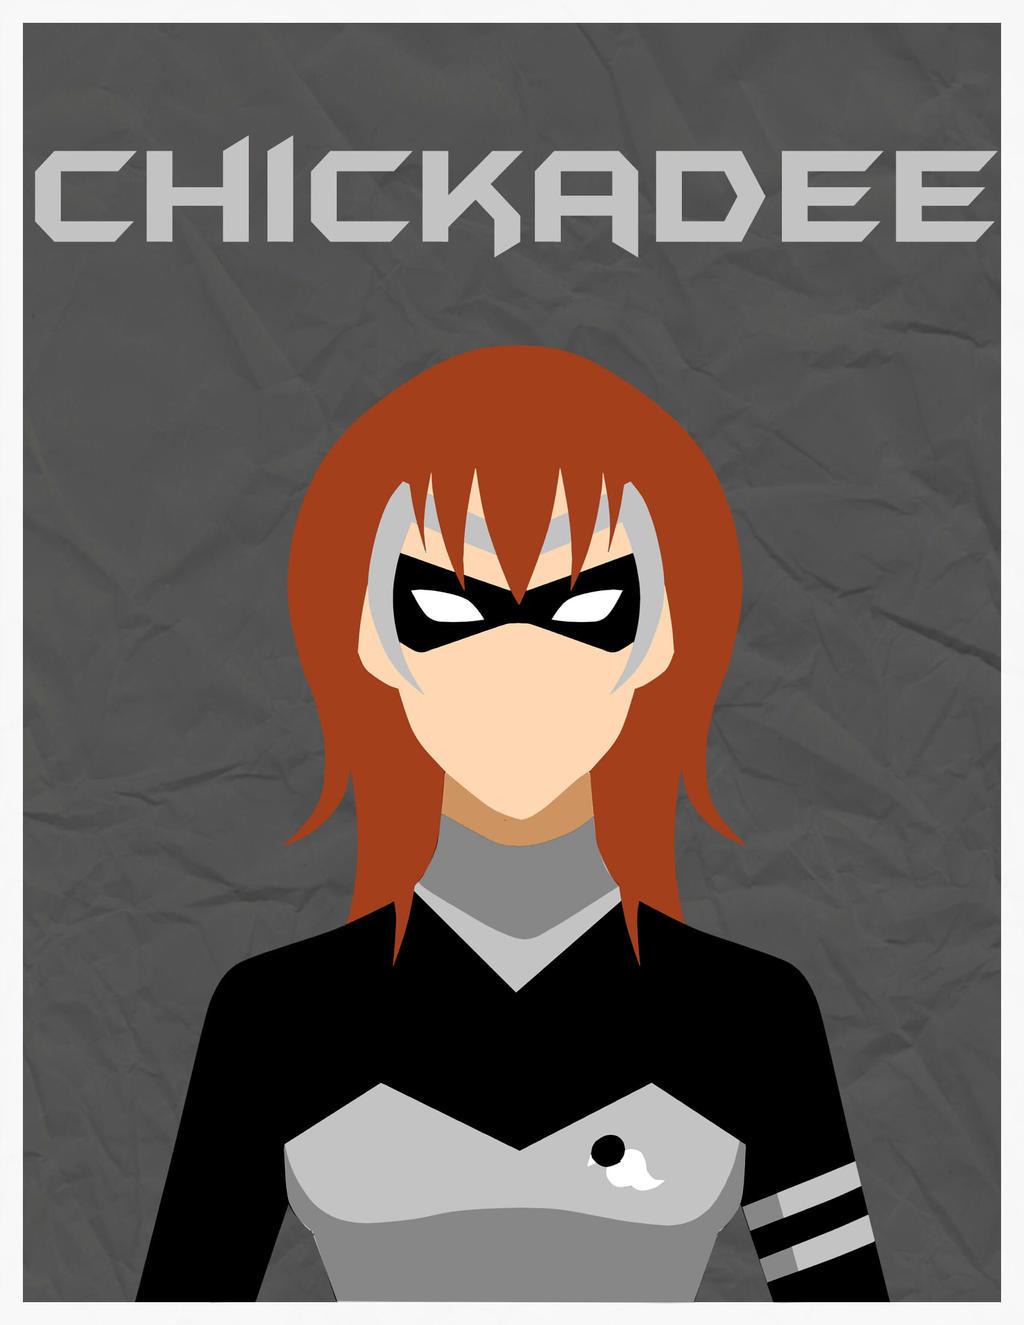 Gift: Chickadee Poster by xDarkHikarix